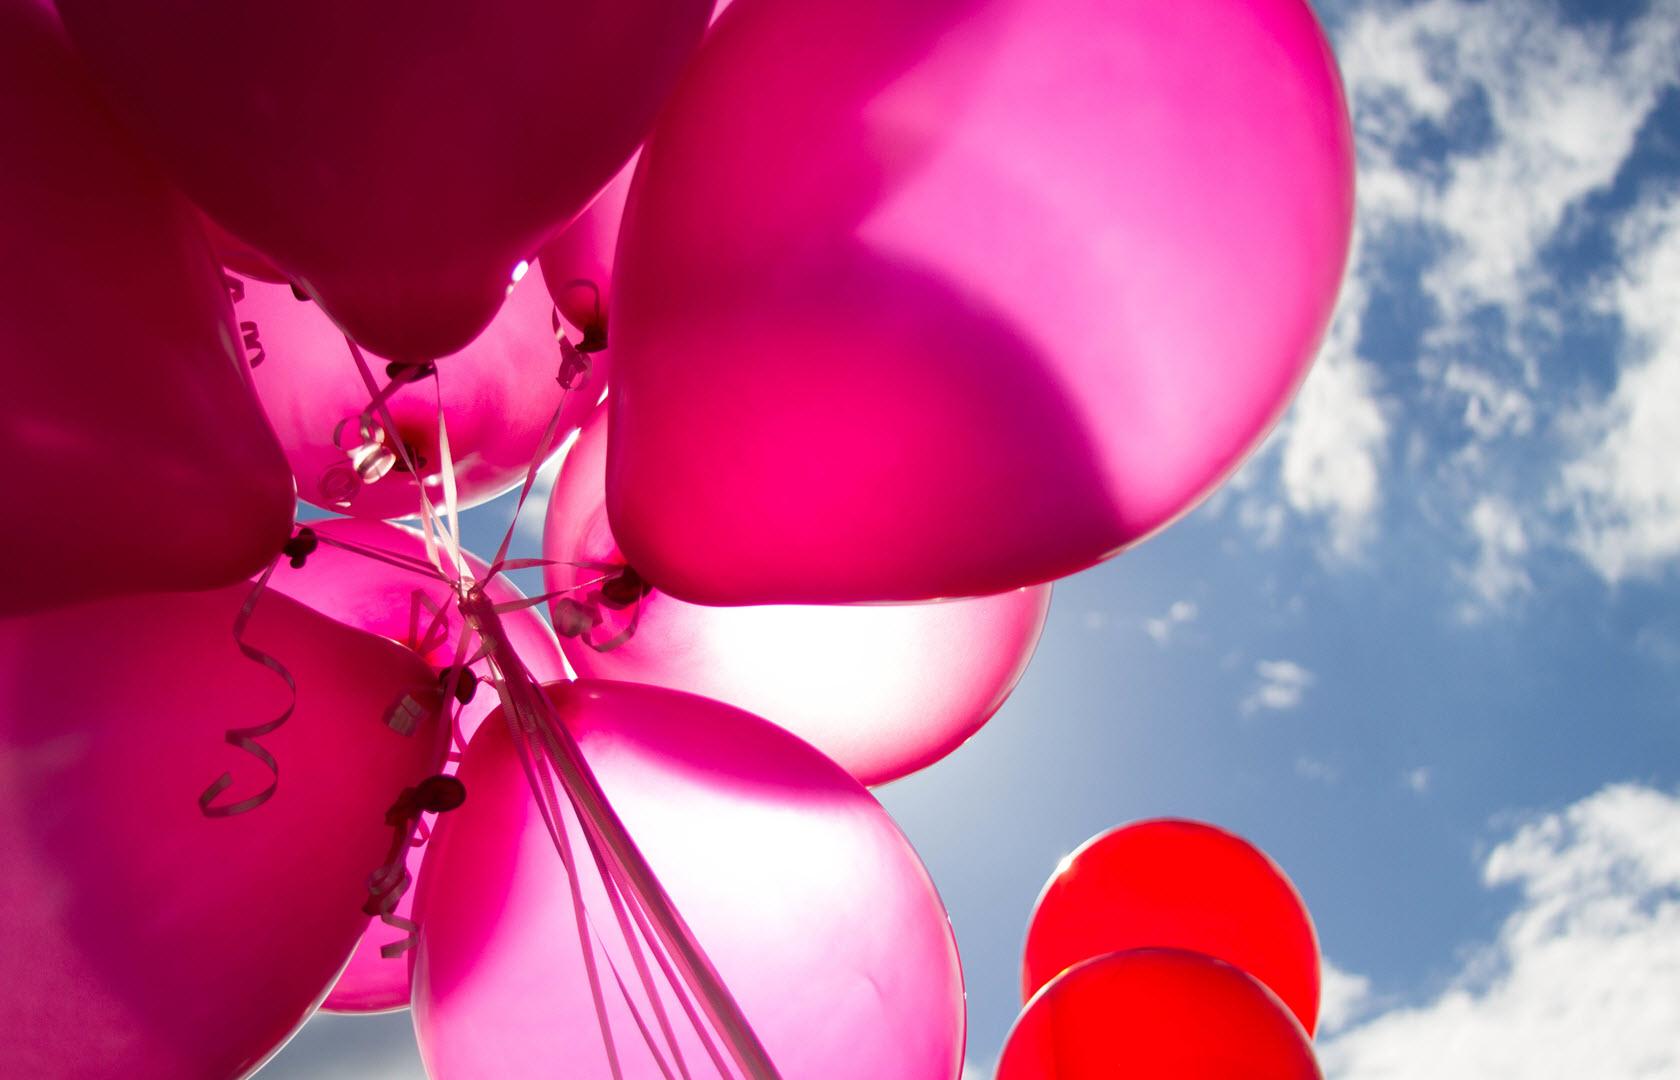 redballoons.jpeg